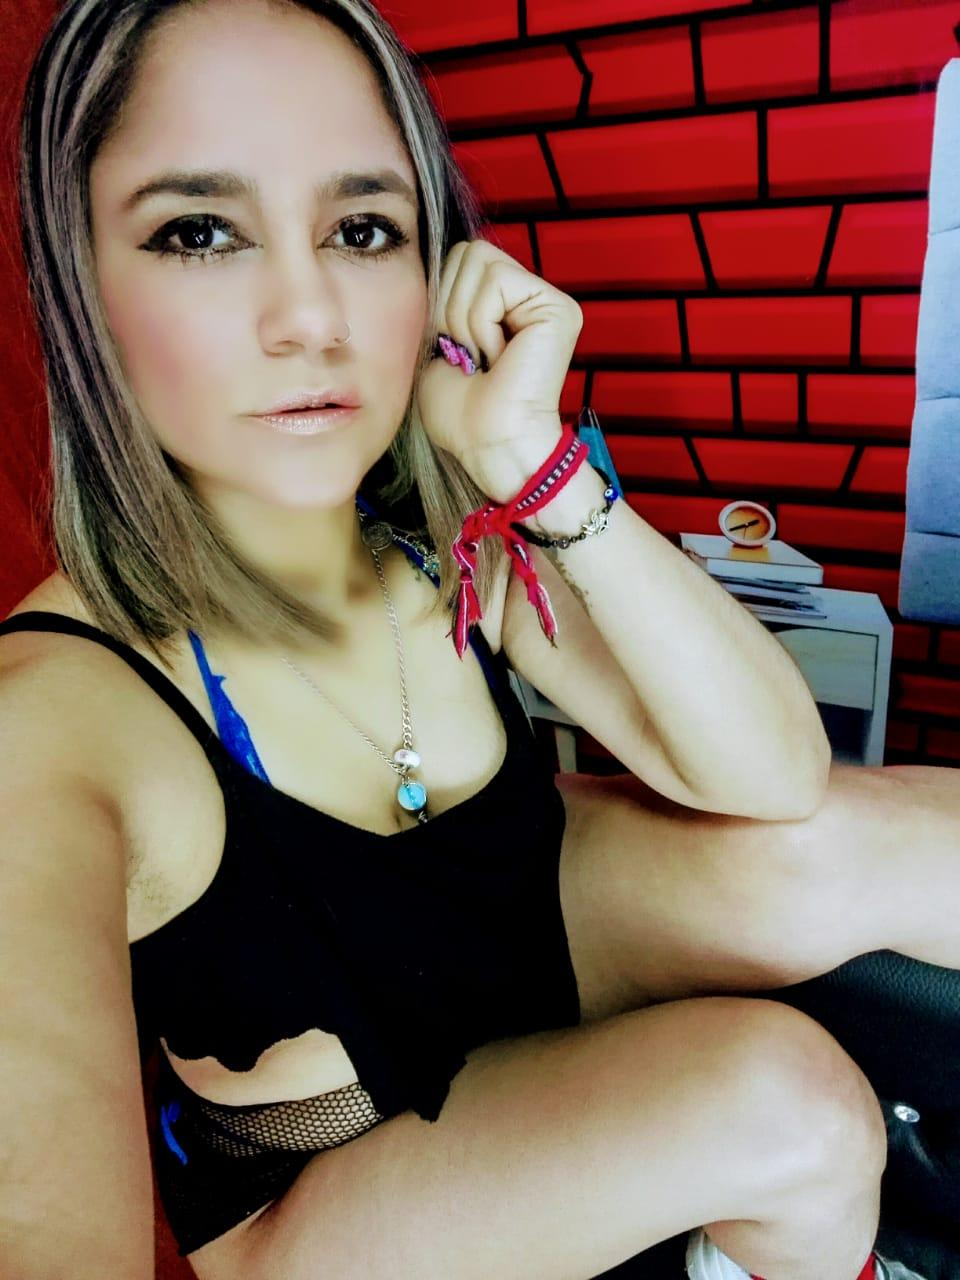 Camila rivero?s=4yn7xh0vvn0znkctfaoisv8r9knrq+bvzg+geb3nh4o=